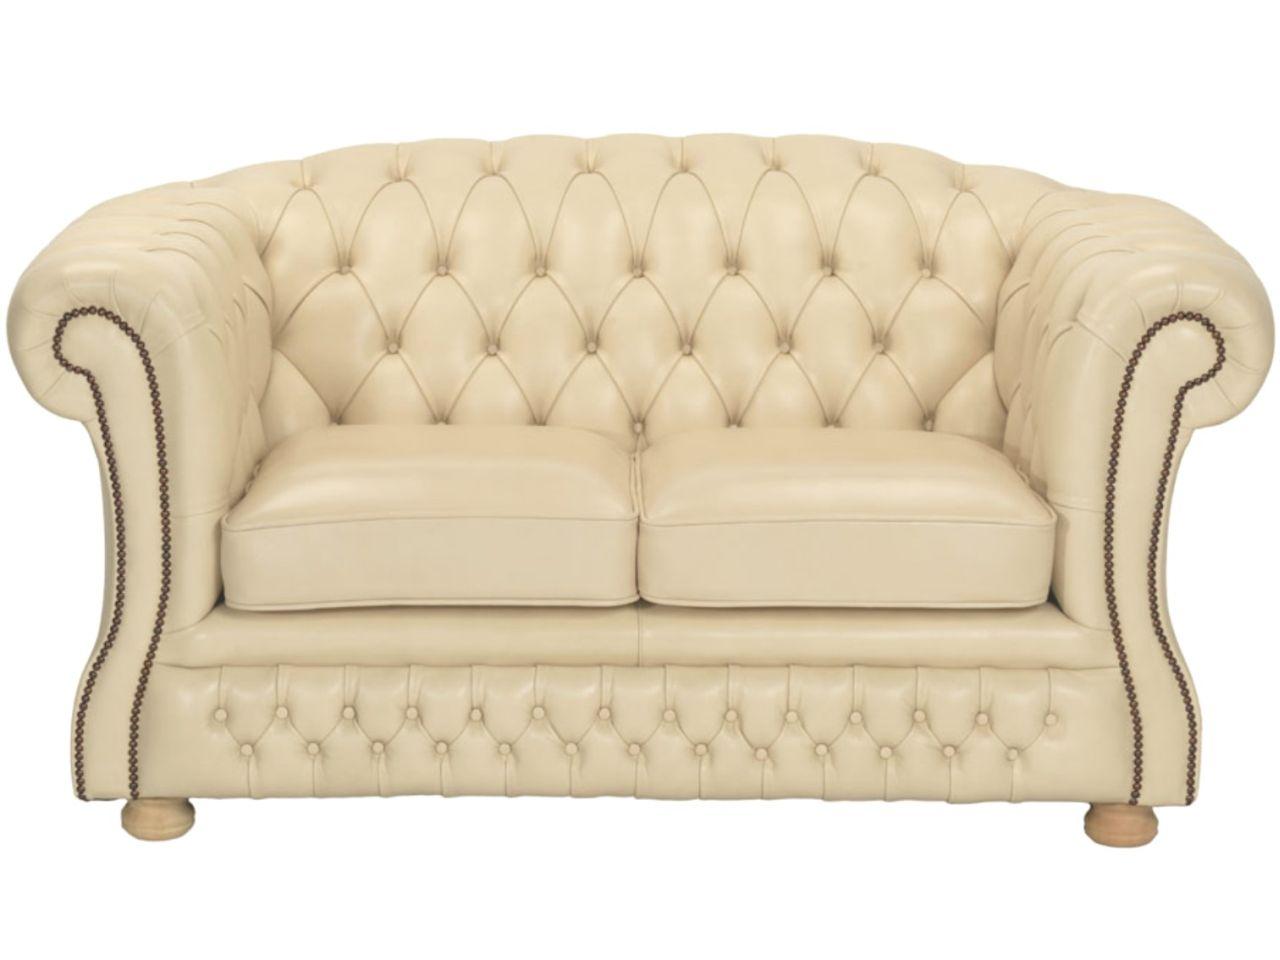 Blenheim 2 Seater - Ivory